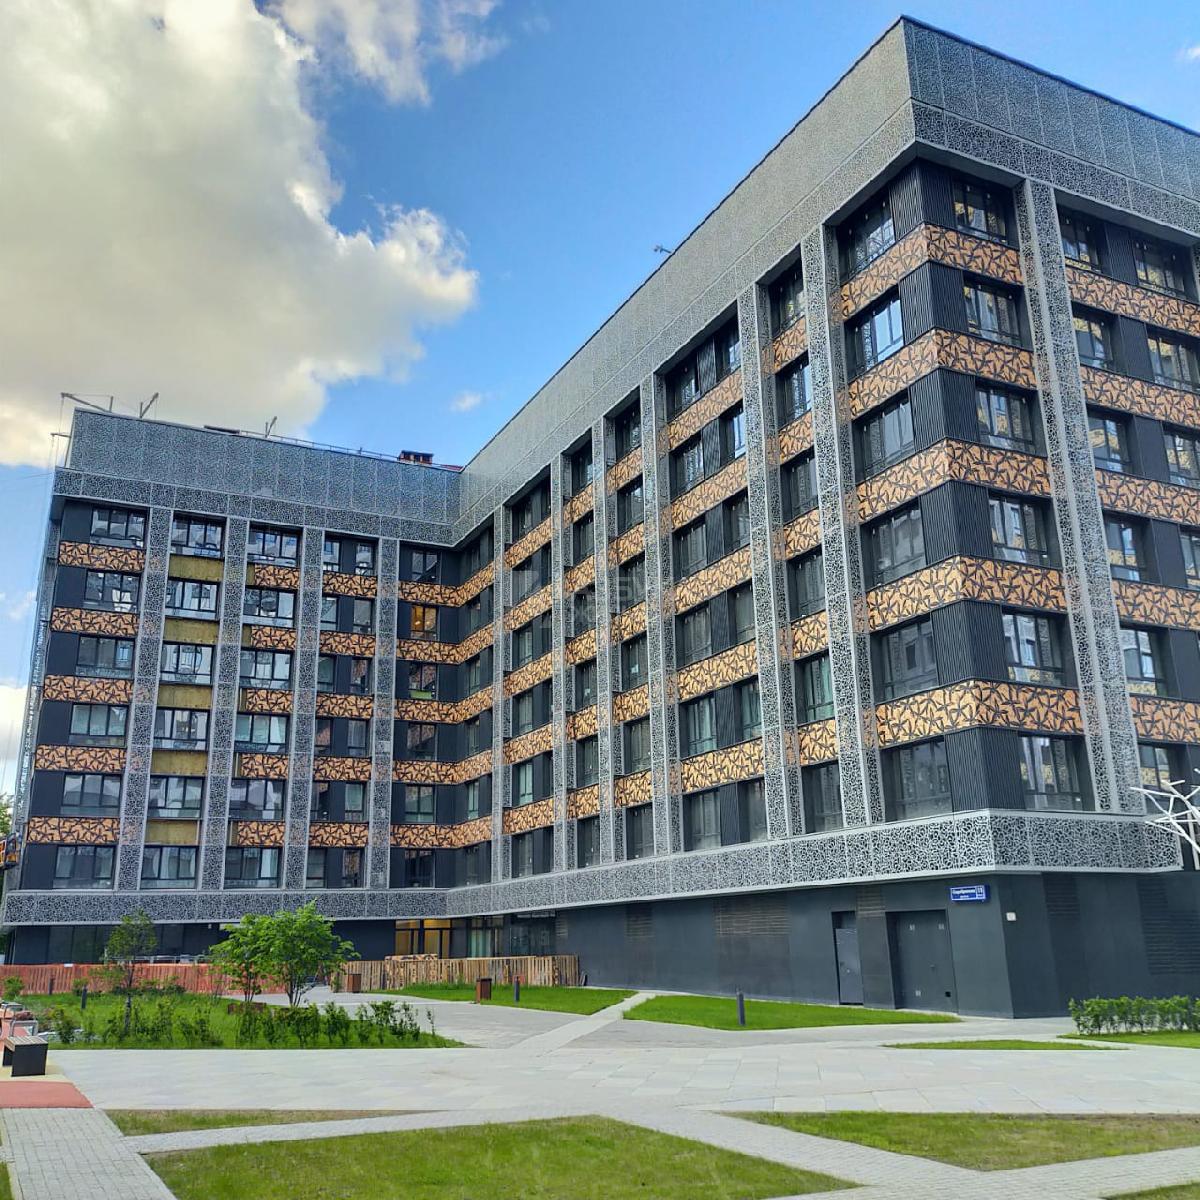 Фото №35 - 3-комнатная квартира, Москва, Серебрякова проезд 11 корпус 1, метро Ботанический сад